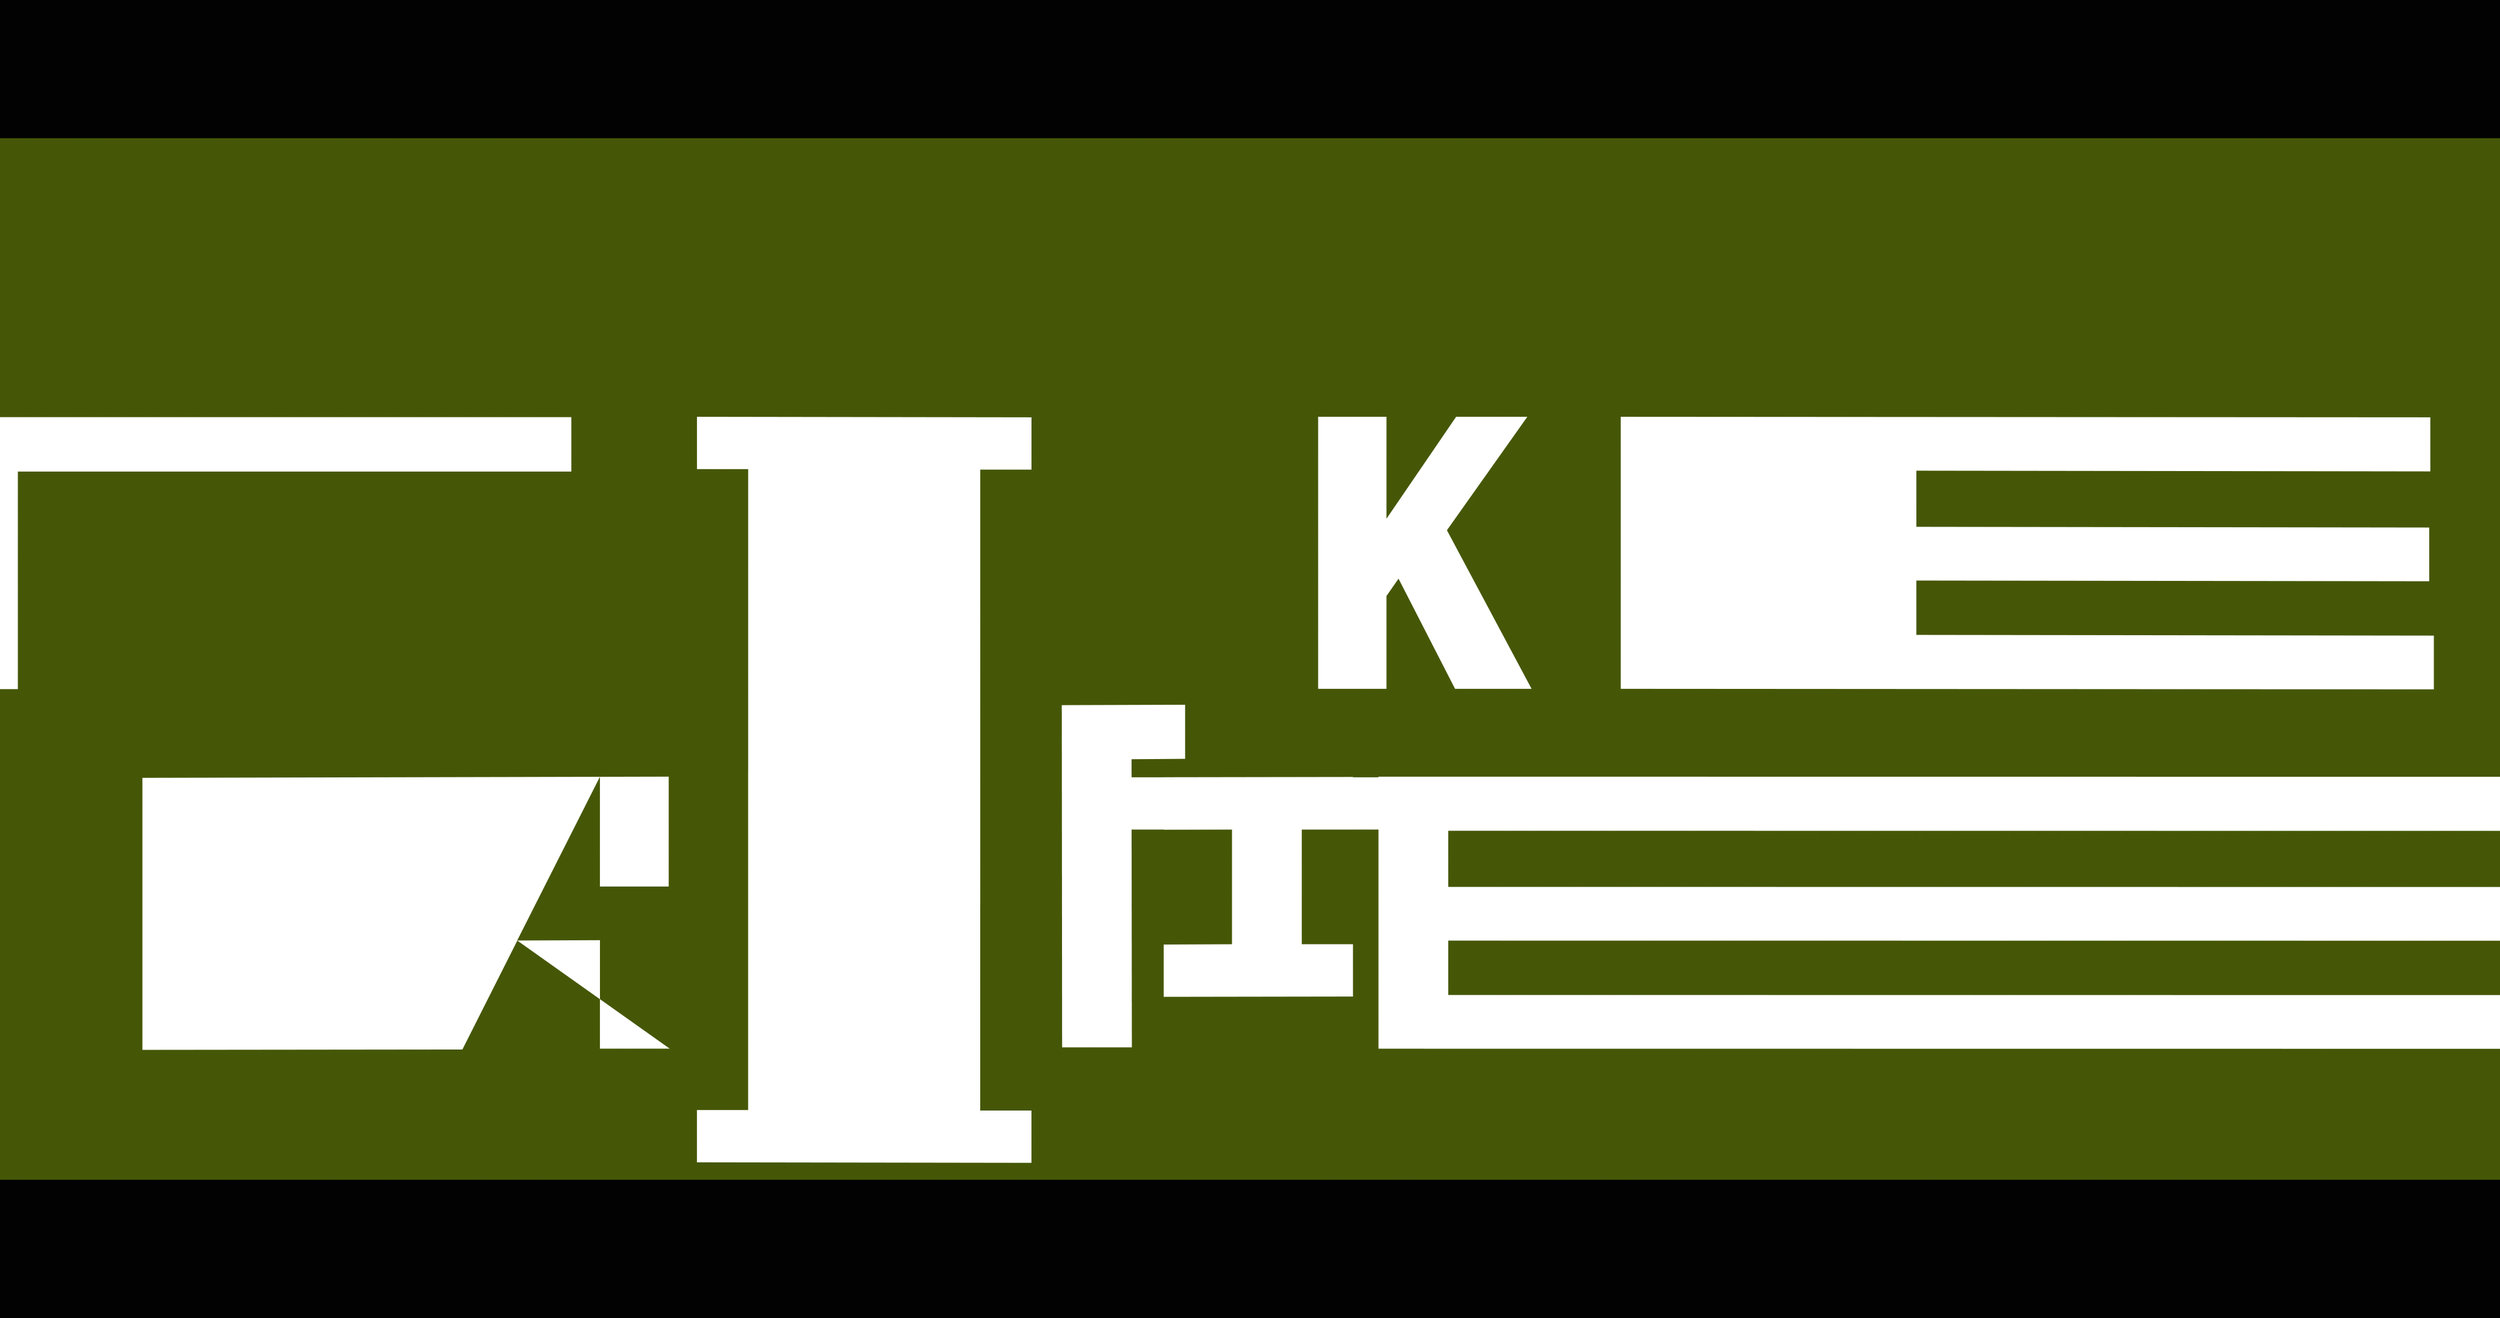 TINK_002.jpg